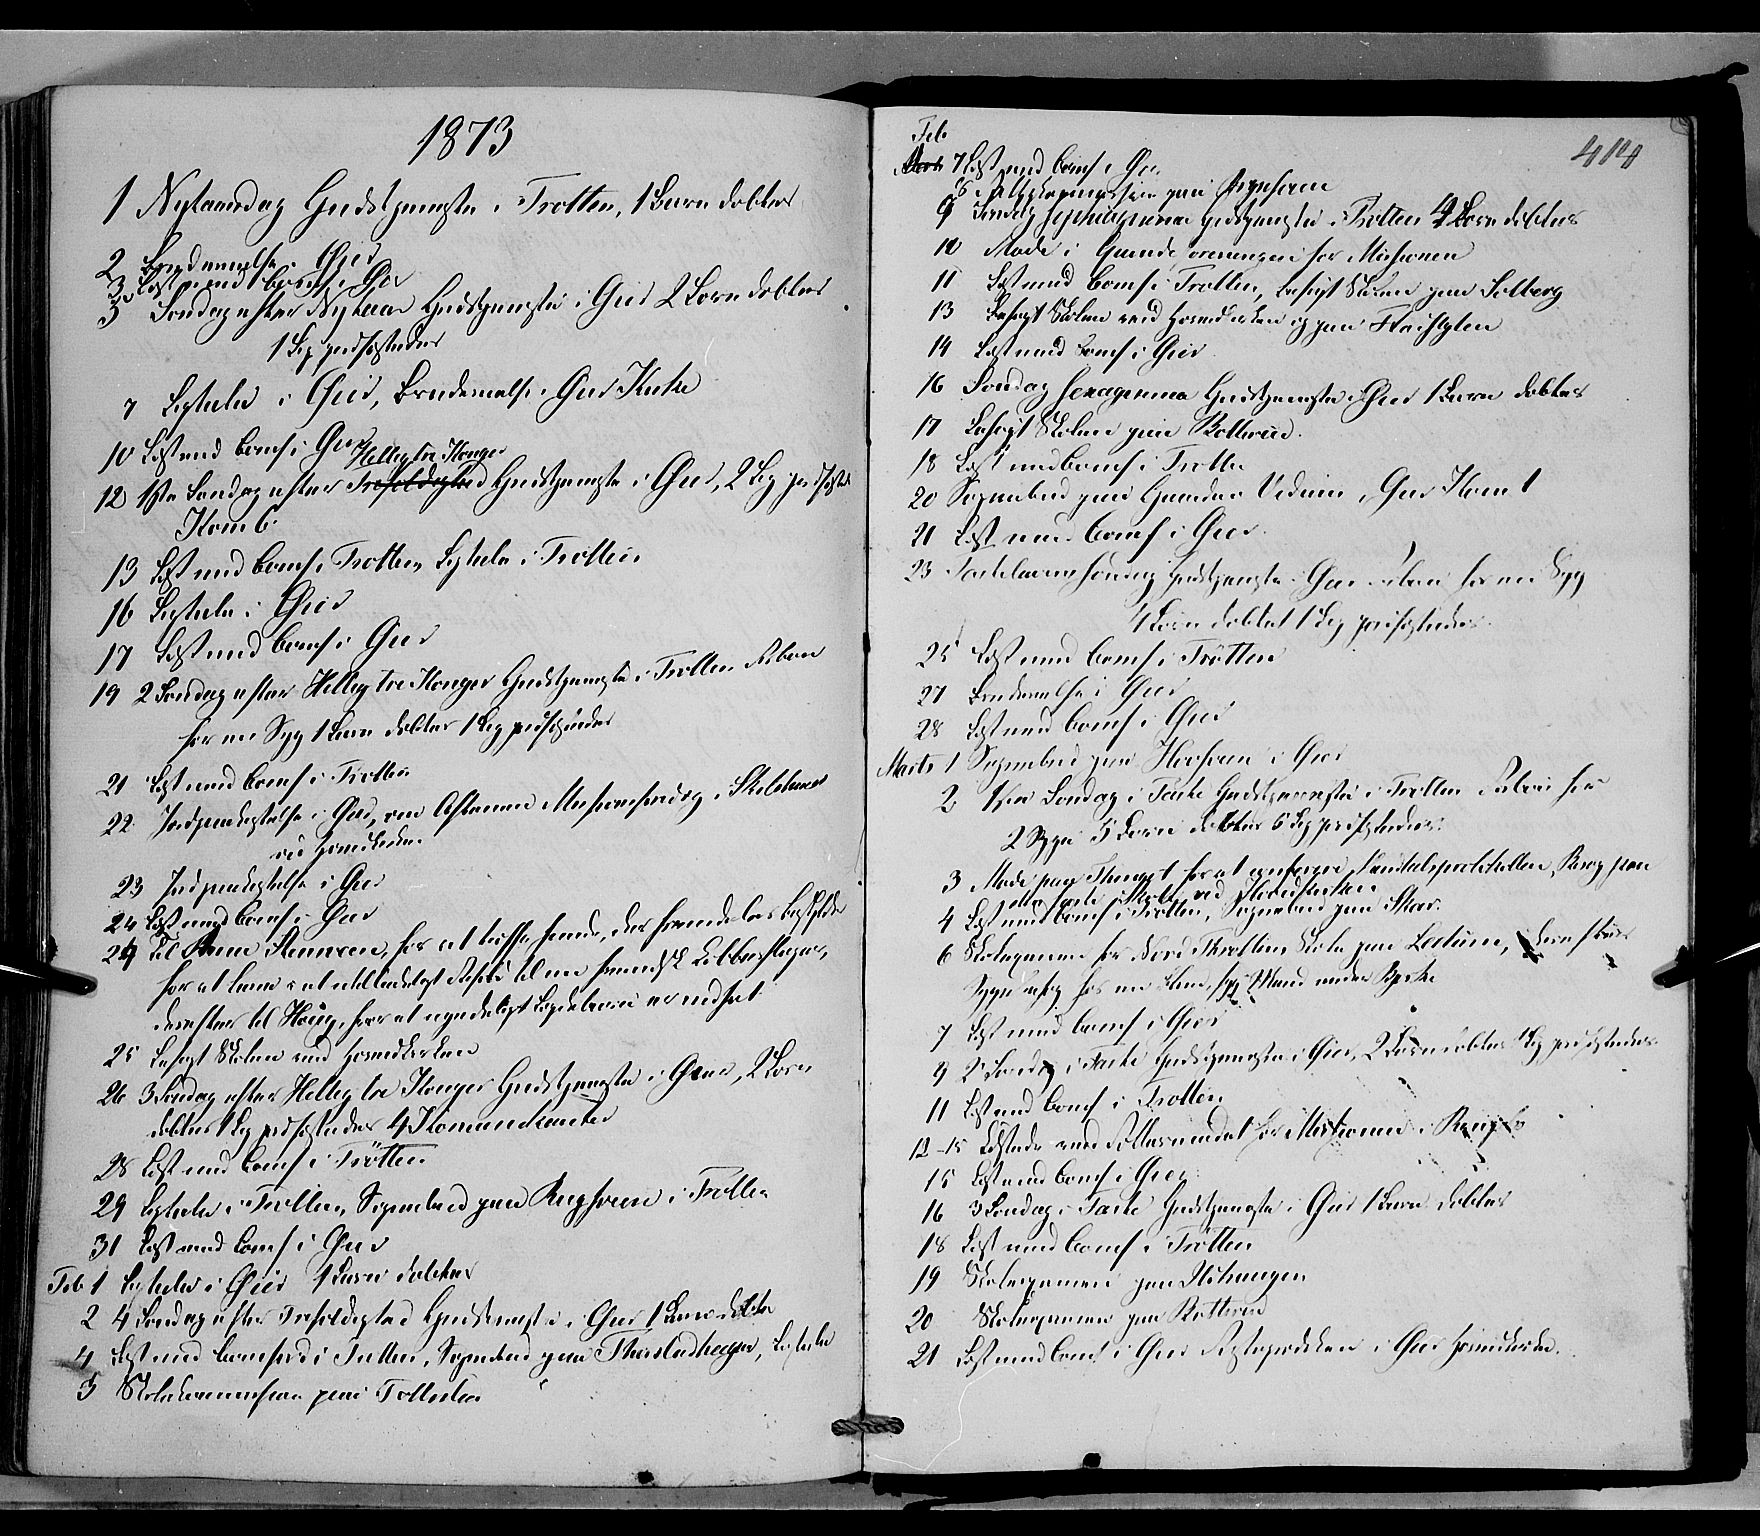 SAH, Øyer prestekontor, Ministerialbok nr. 6, 1858-1874, s. 414